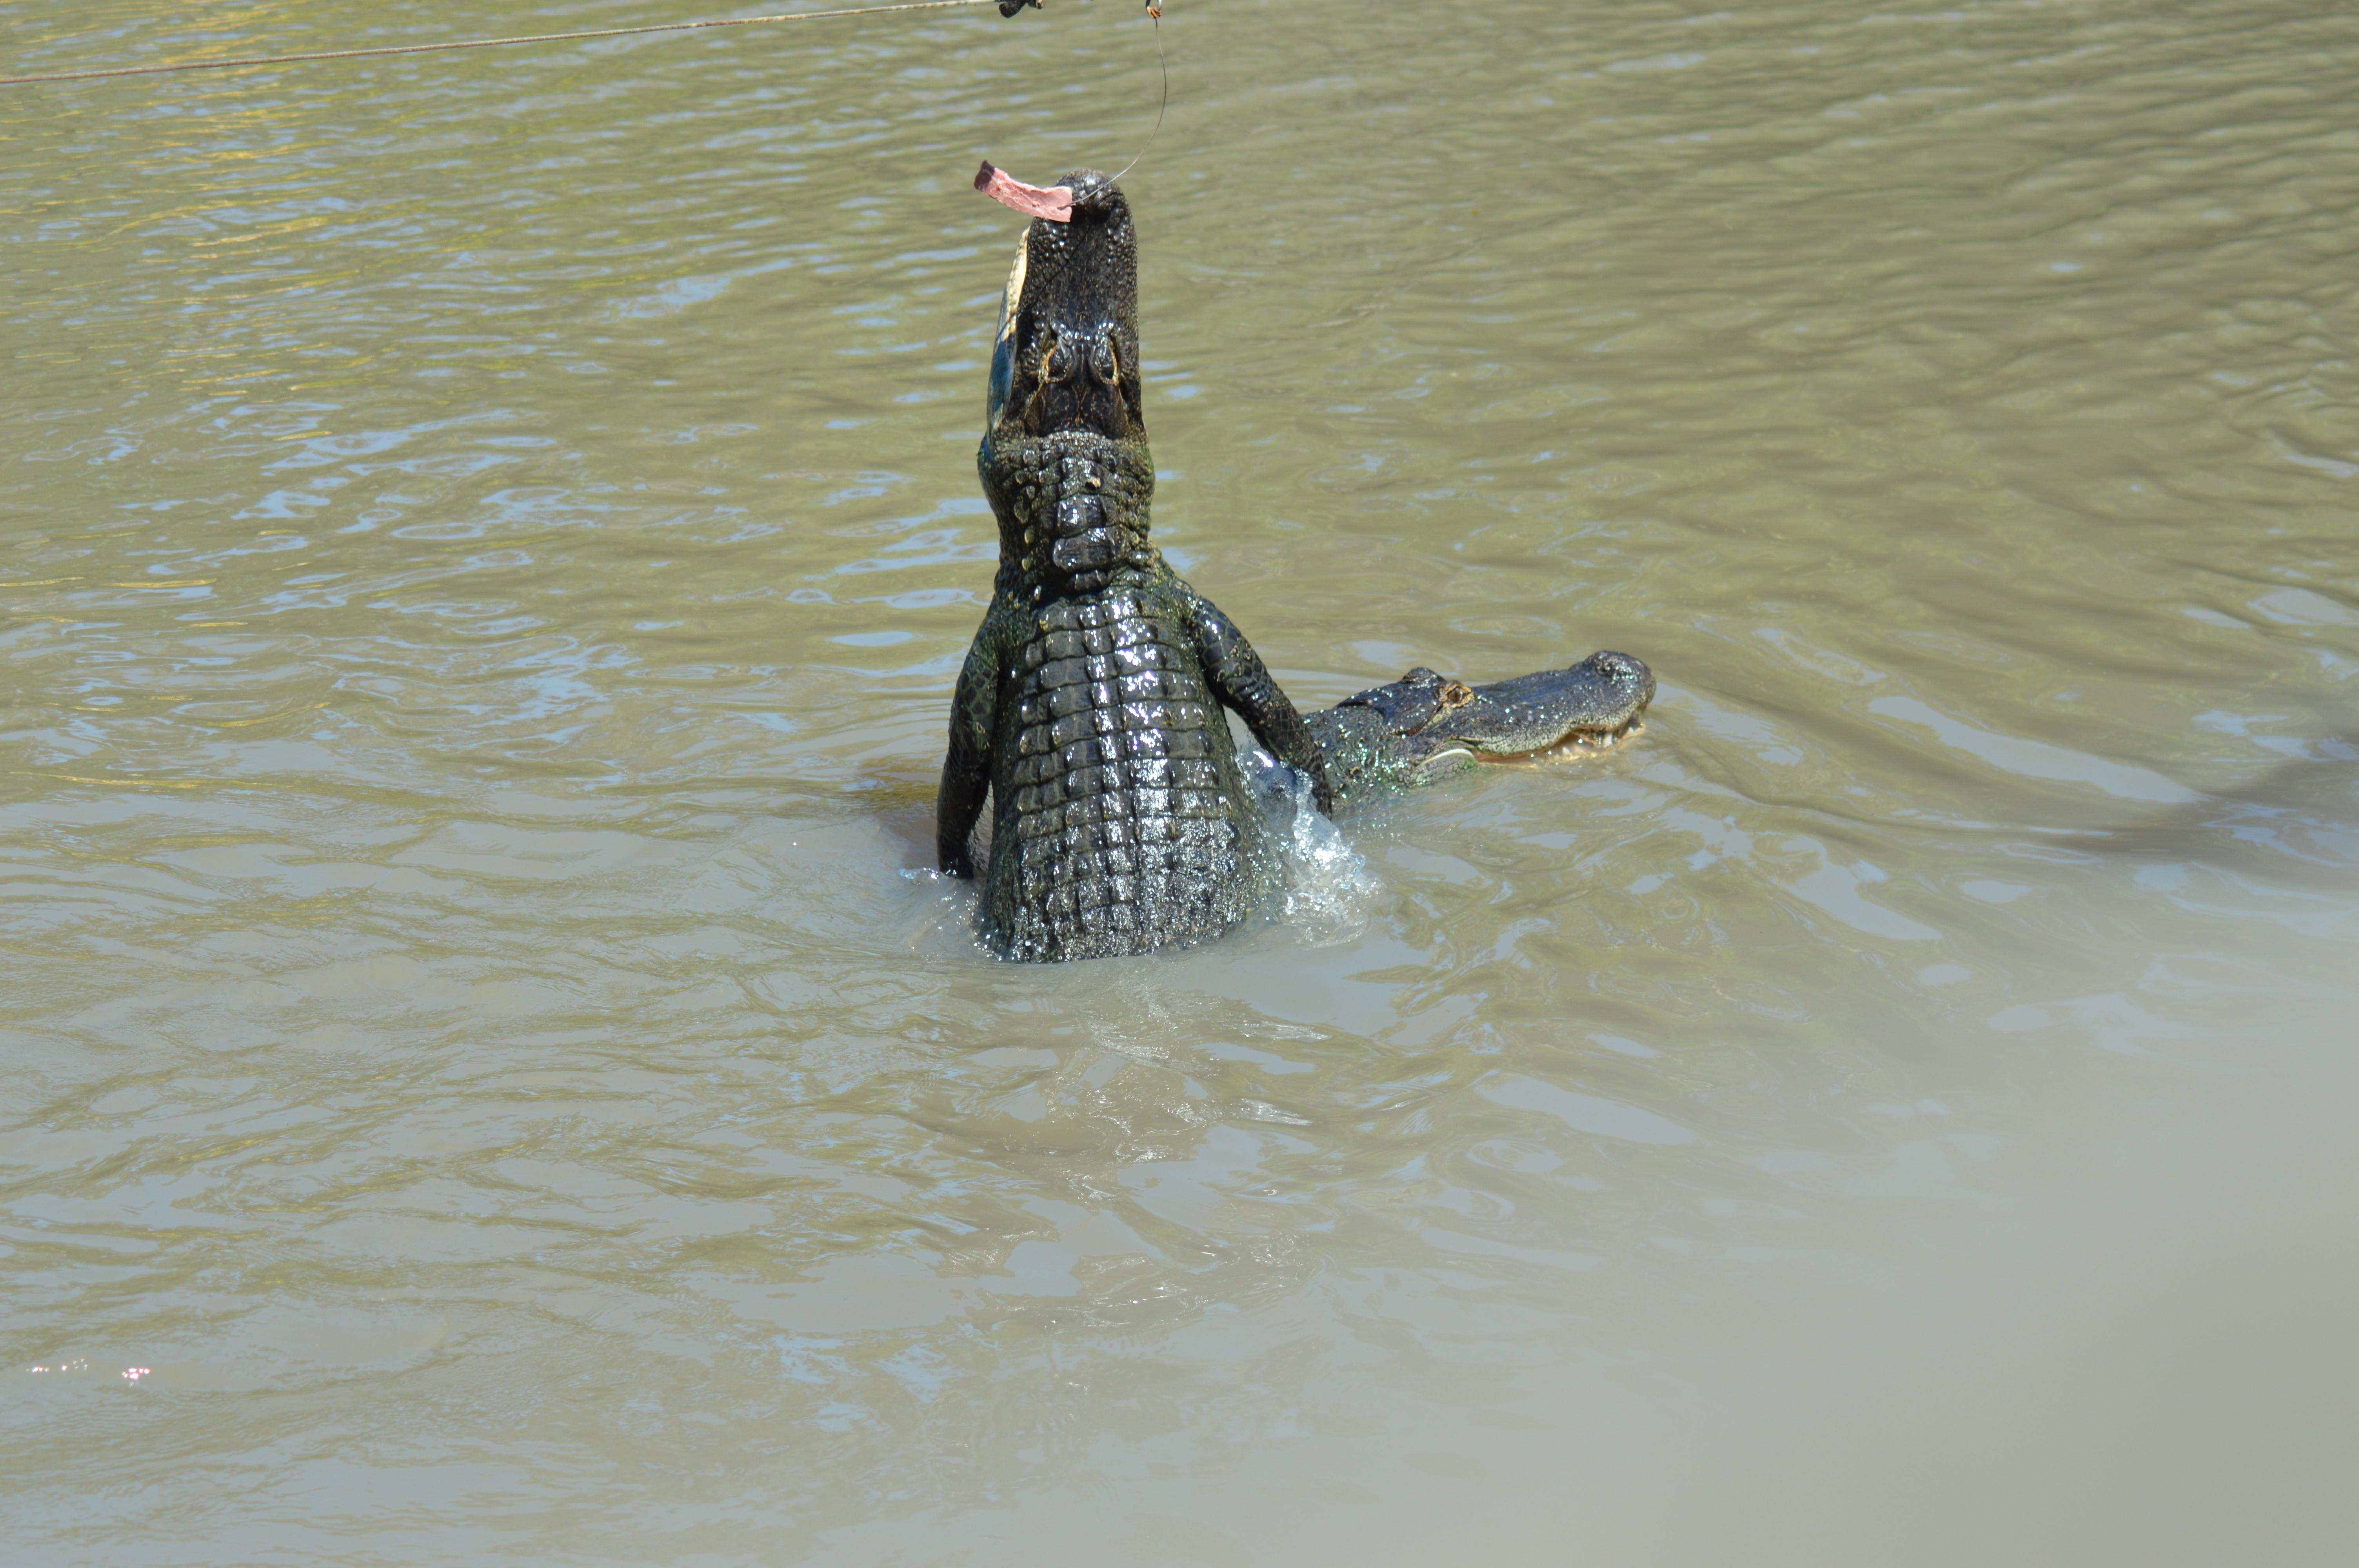 American alligator jumping